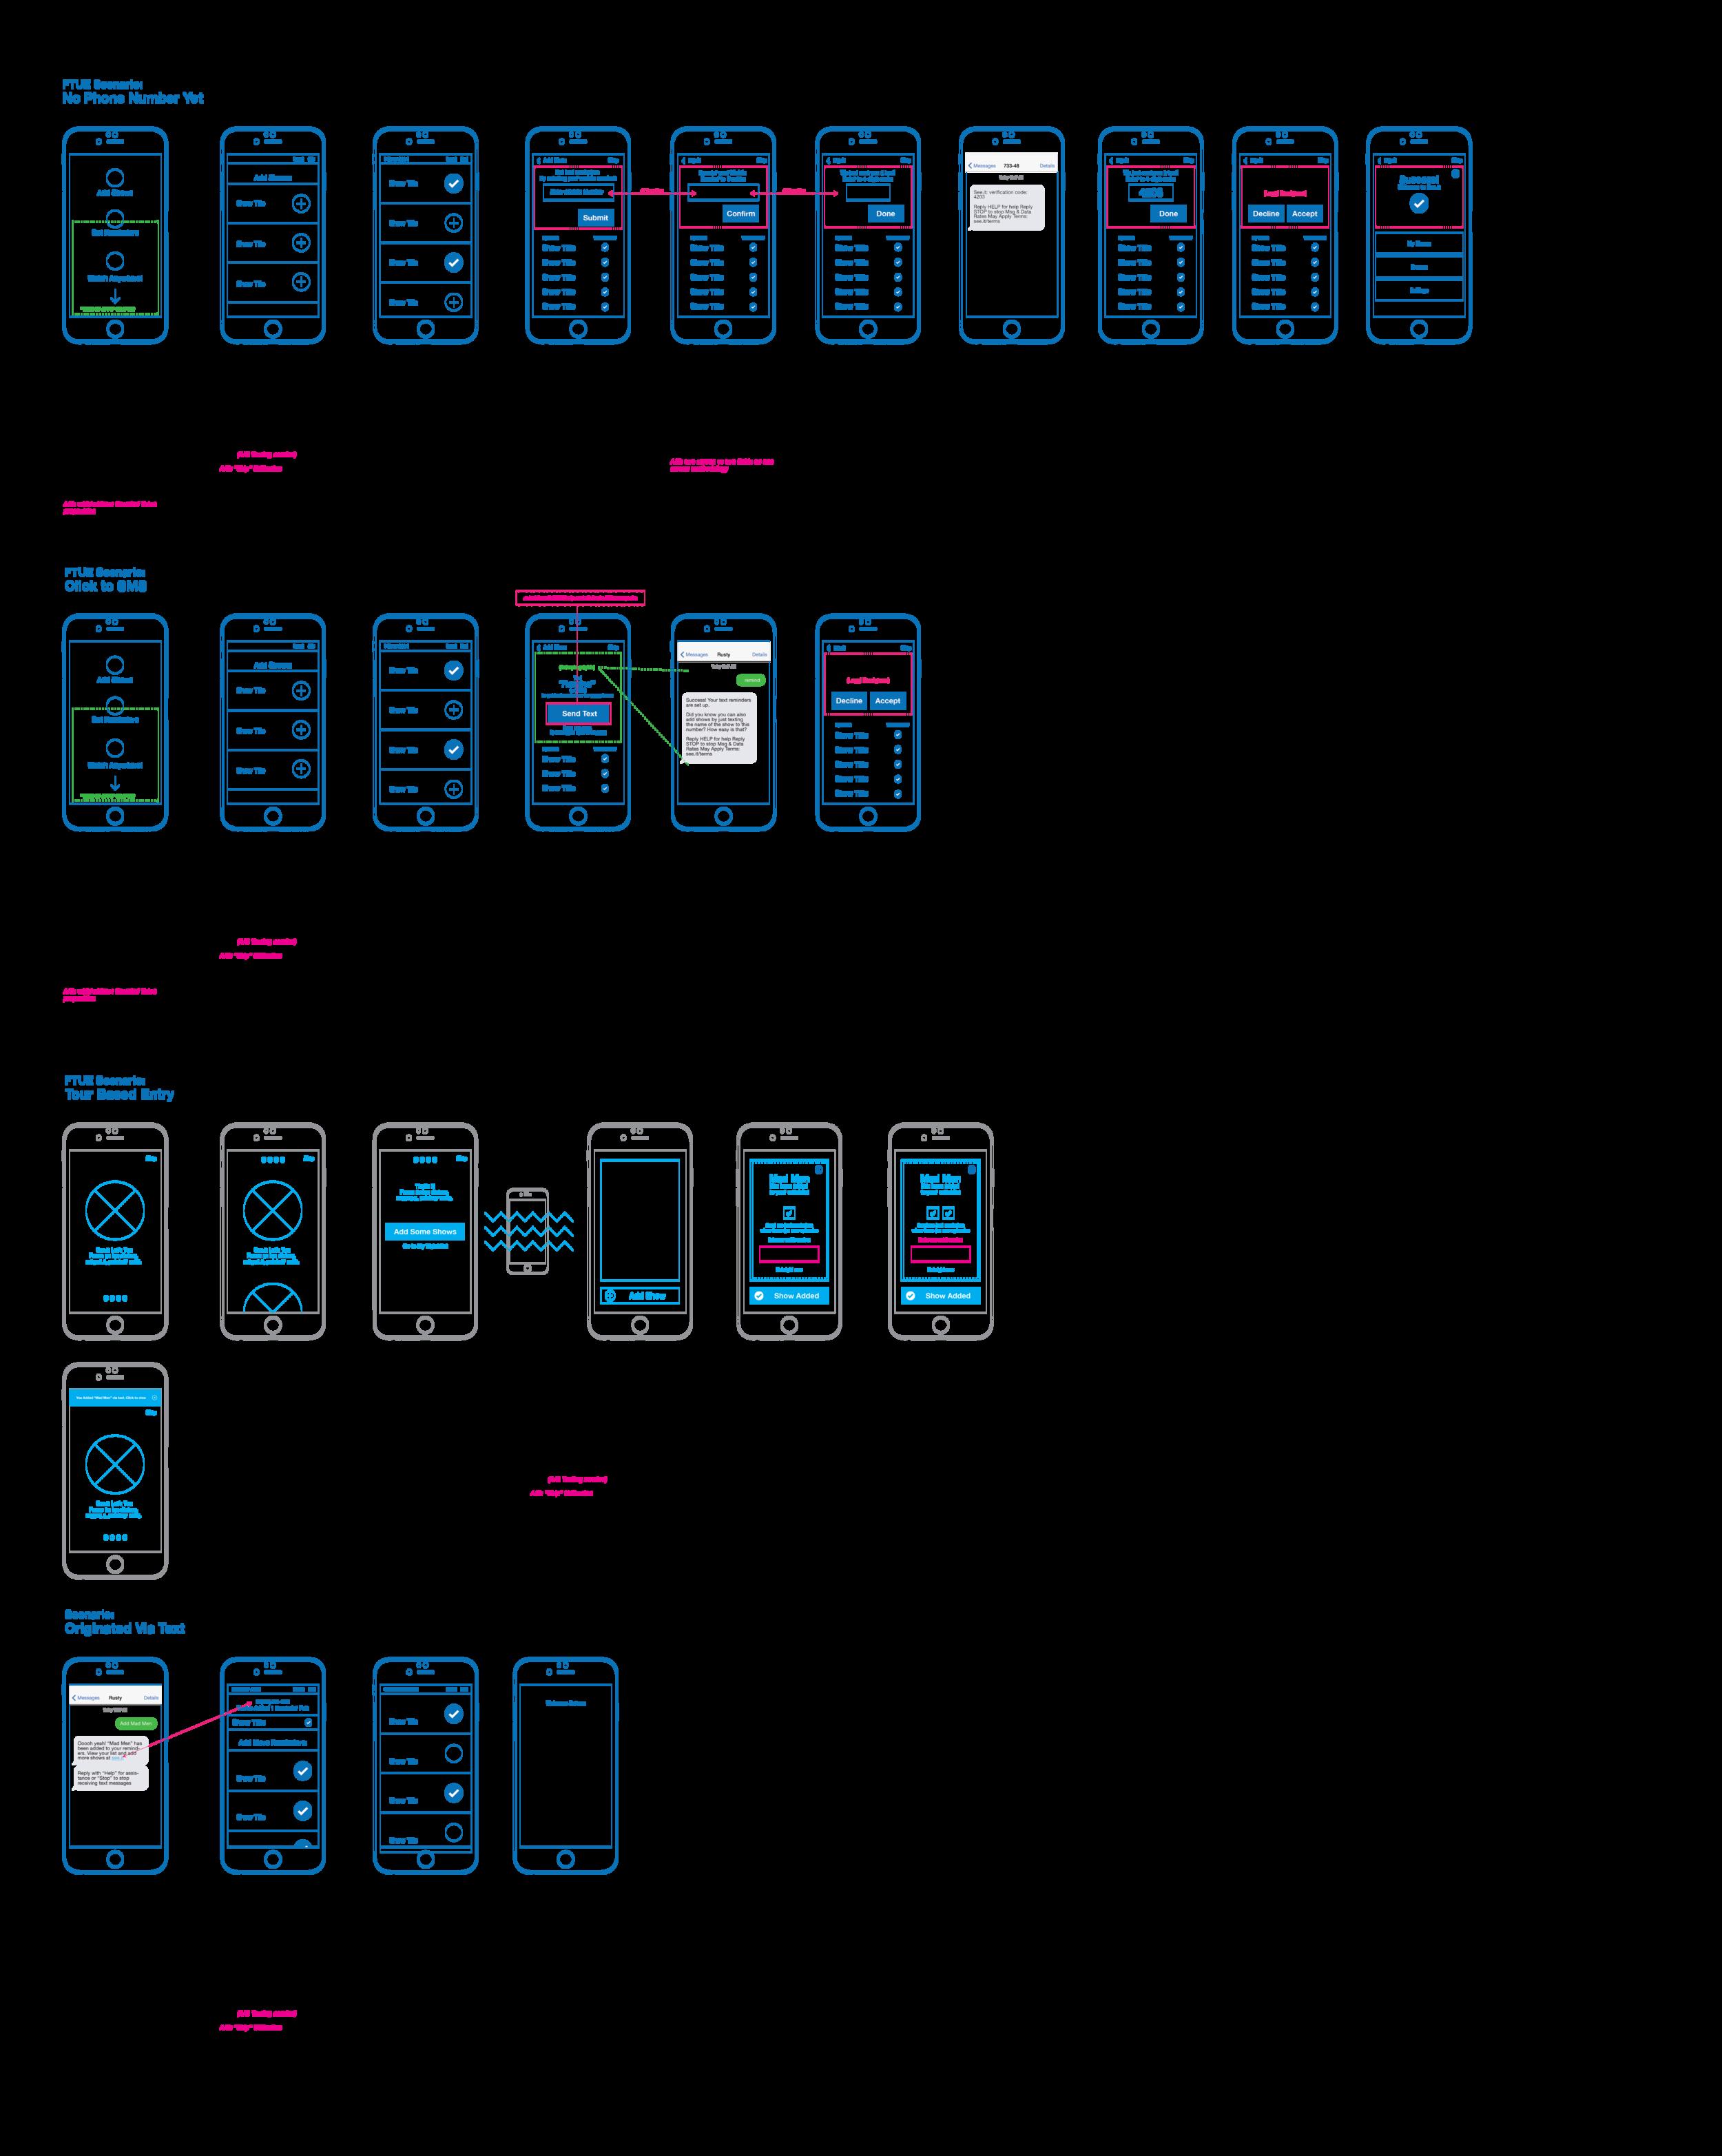 seeit-onboarding-flow-options